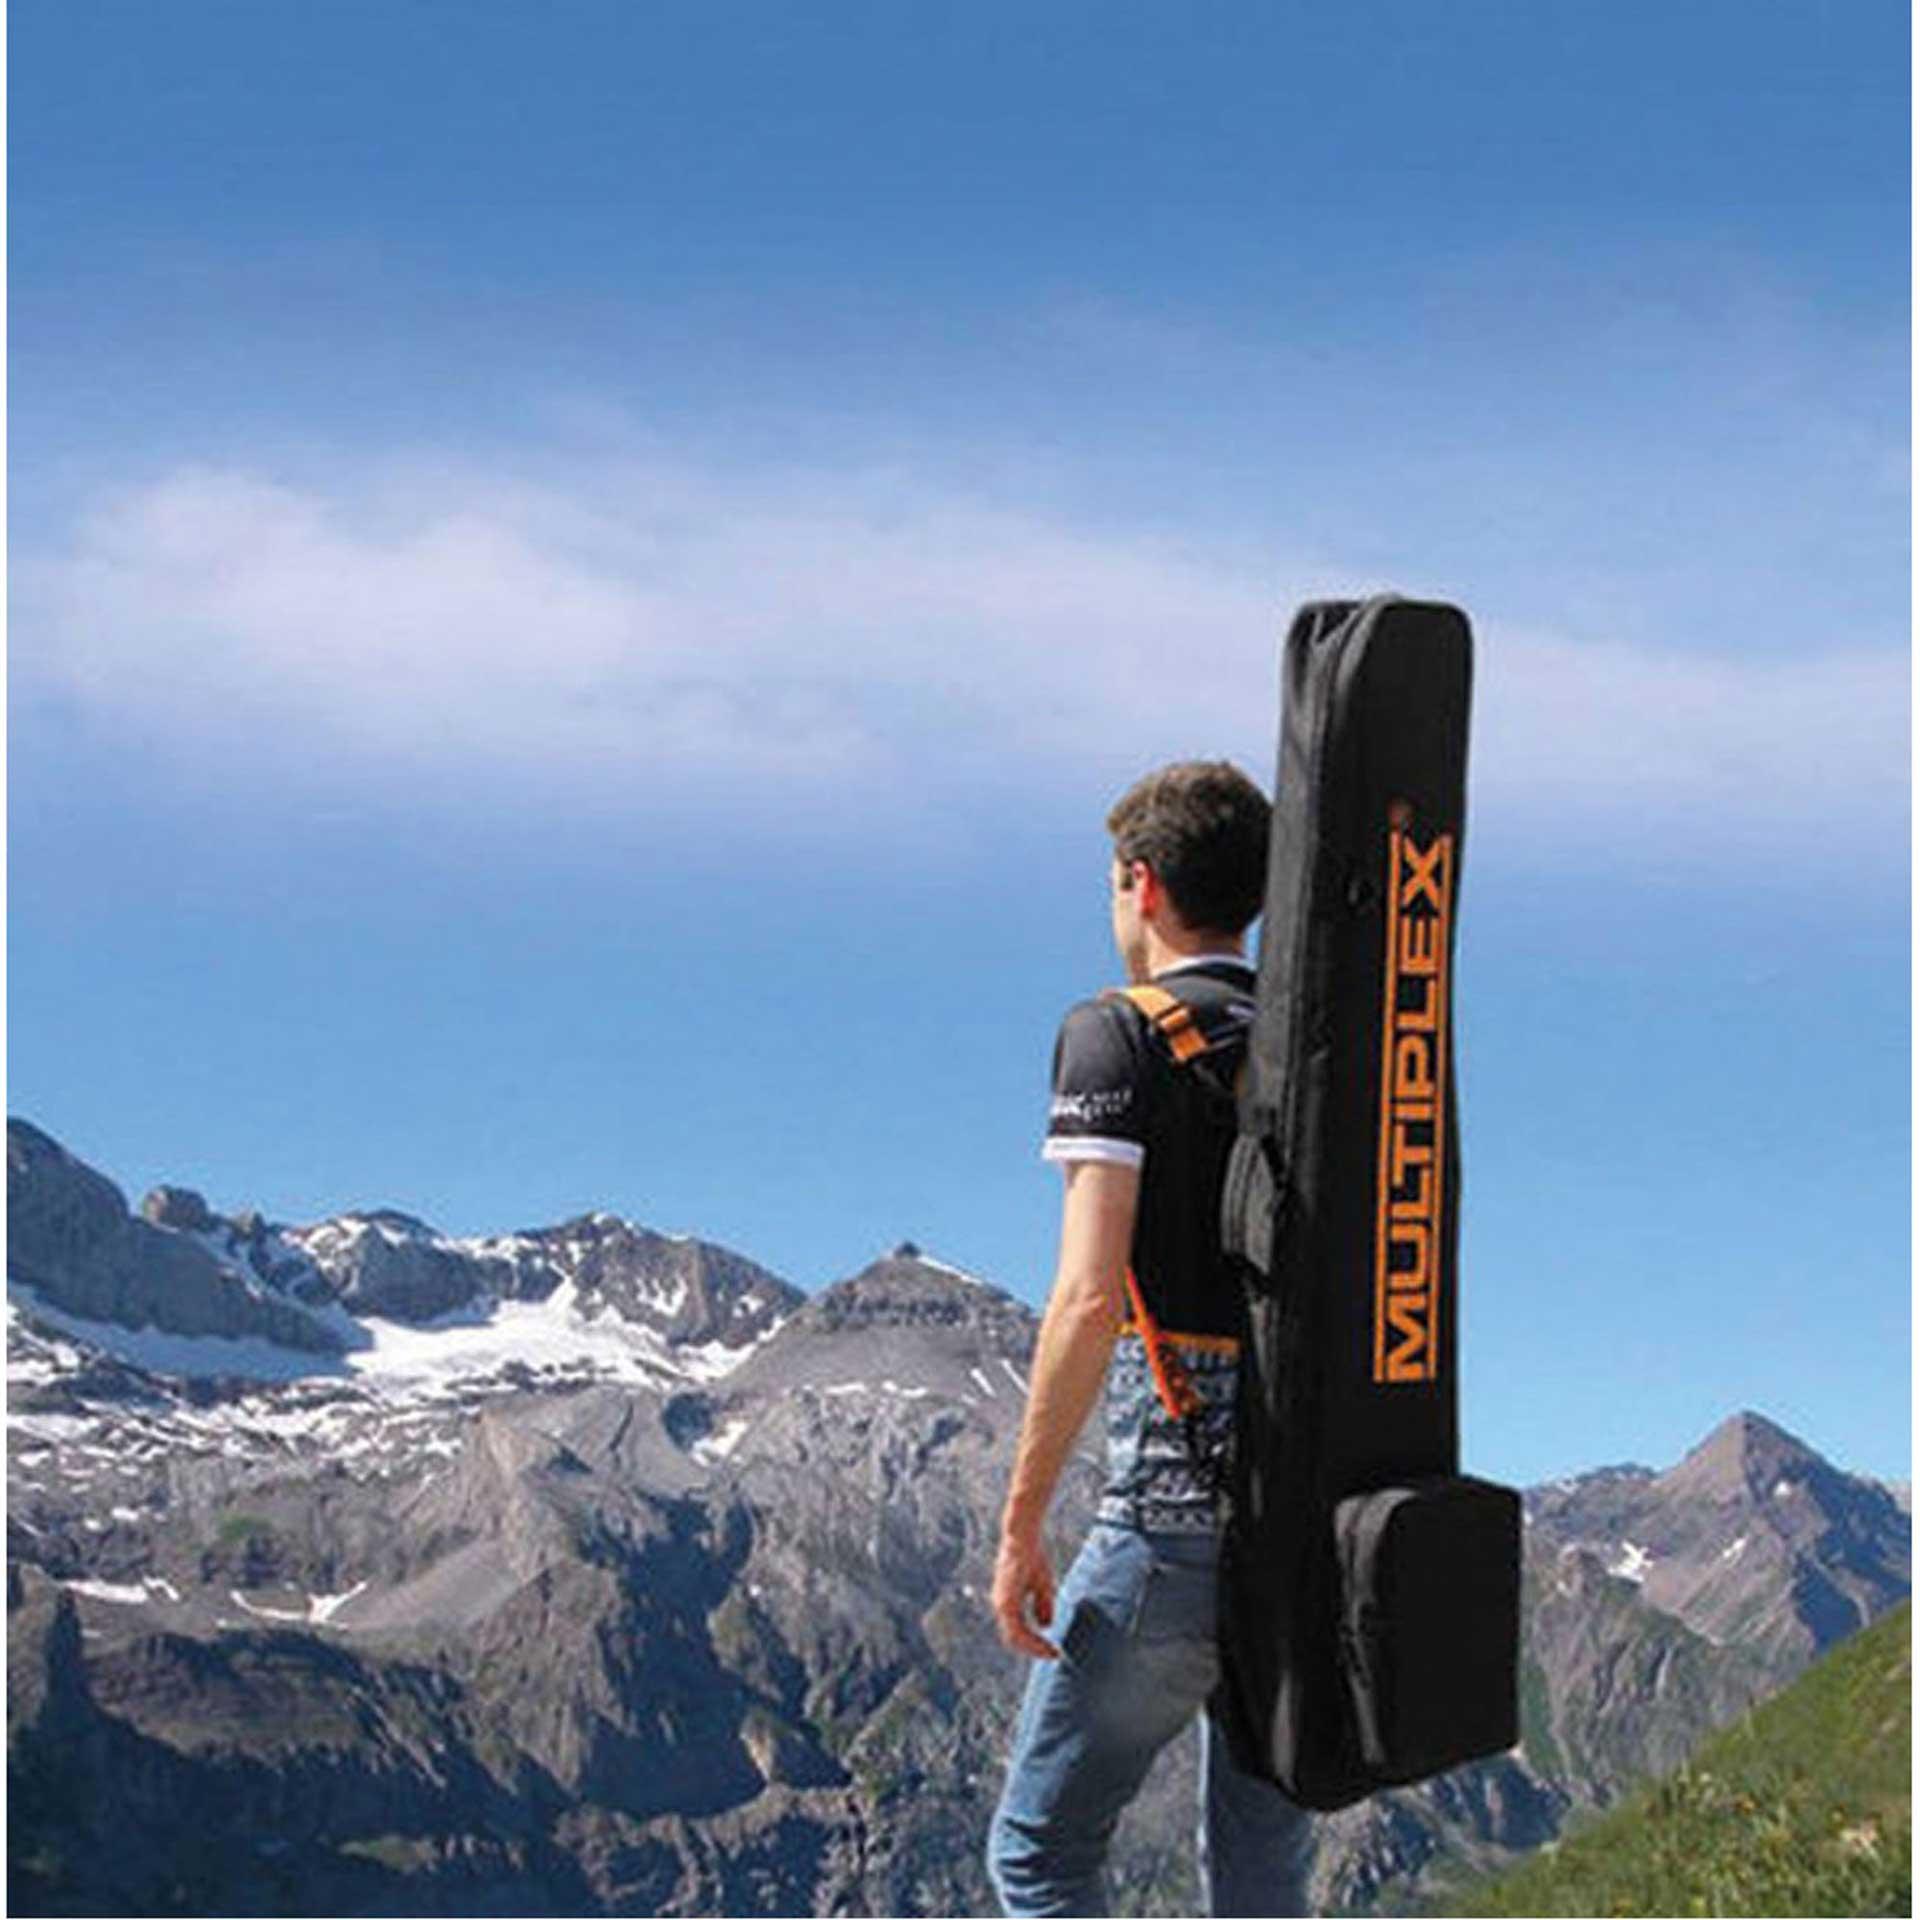 MULTIPLEX MODEL BACKPACK UNIVERSAL 1270/150/270MM MODEL BAG FOR GLIDER BIS APPROX. 2.5M